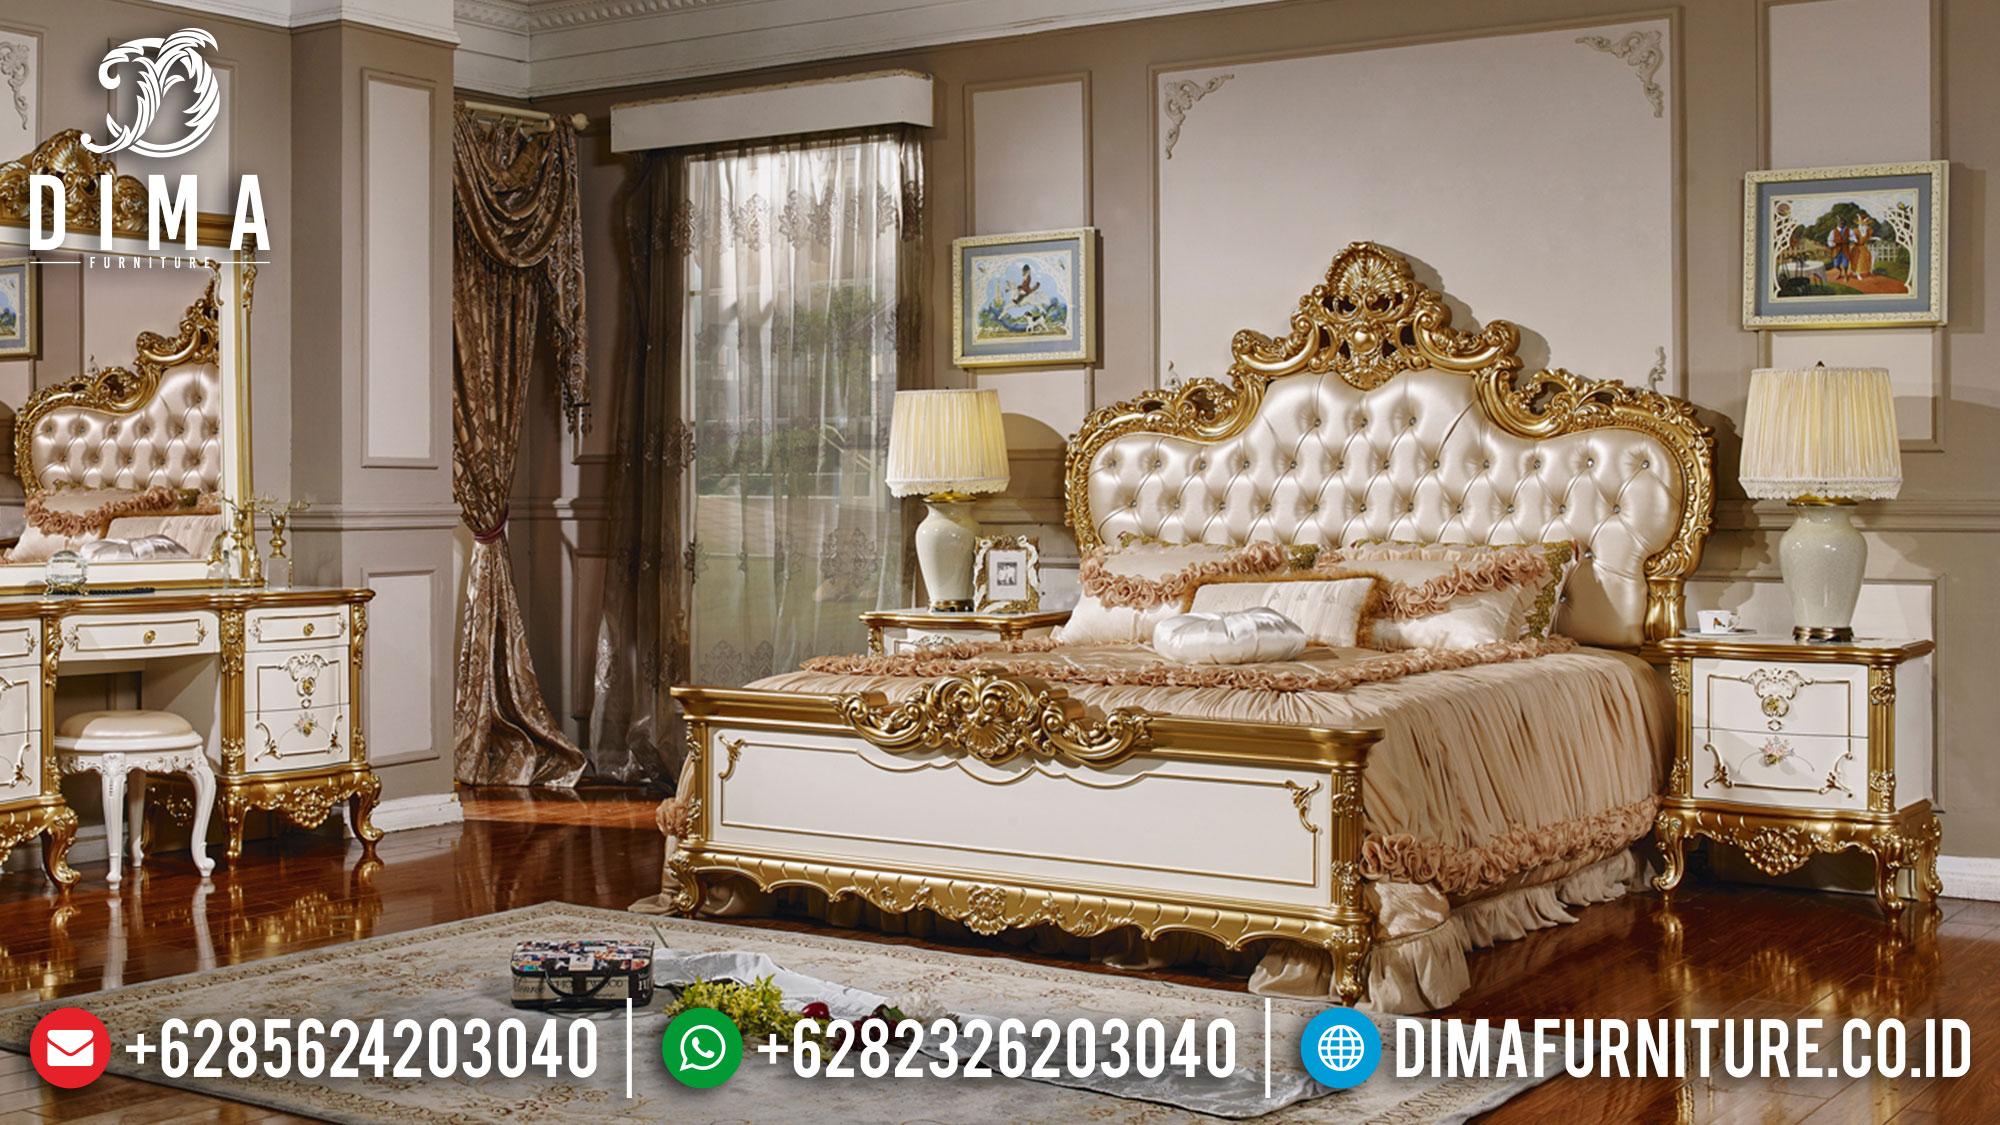 New Model Tempat Tidur Mewah Ukiran Luxury Wonderful Golden Light Color ST-1145